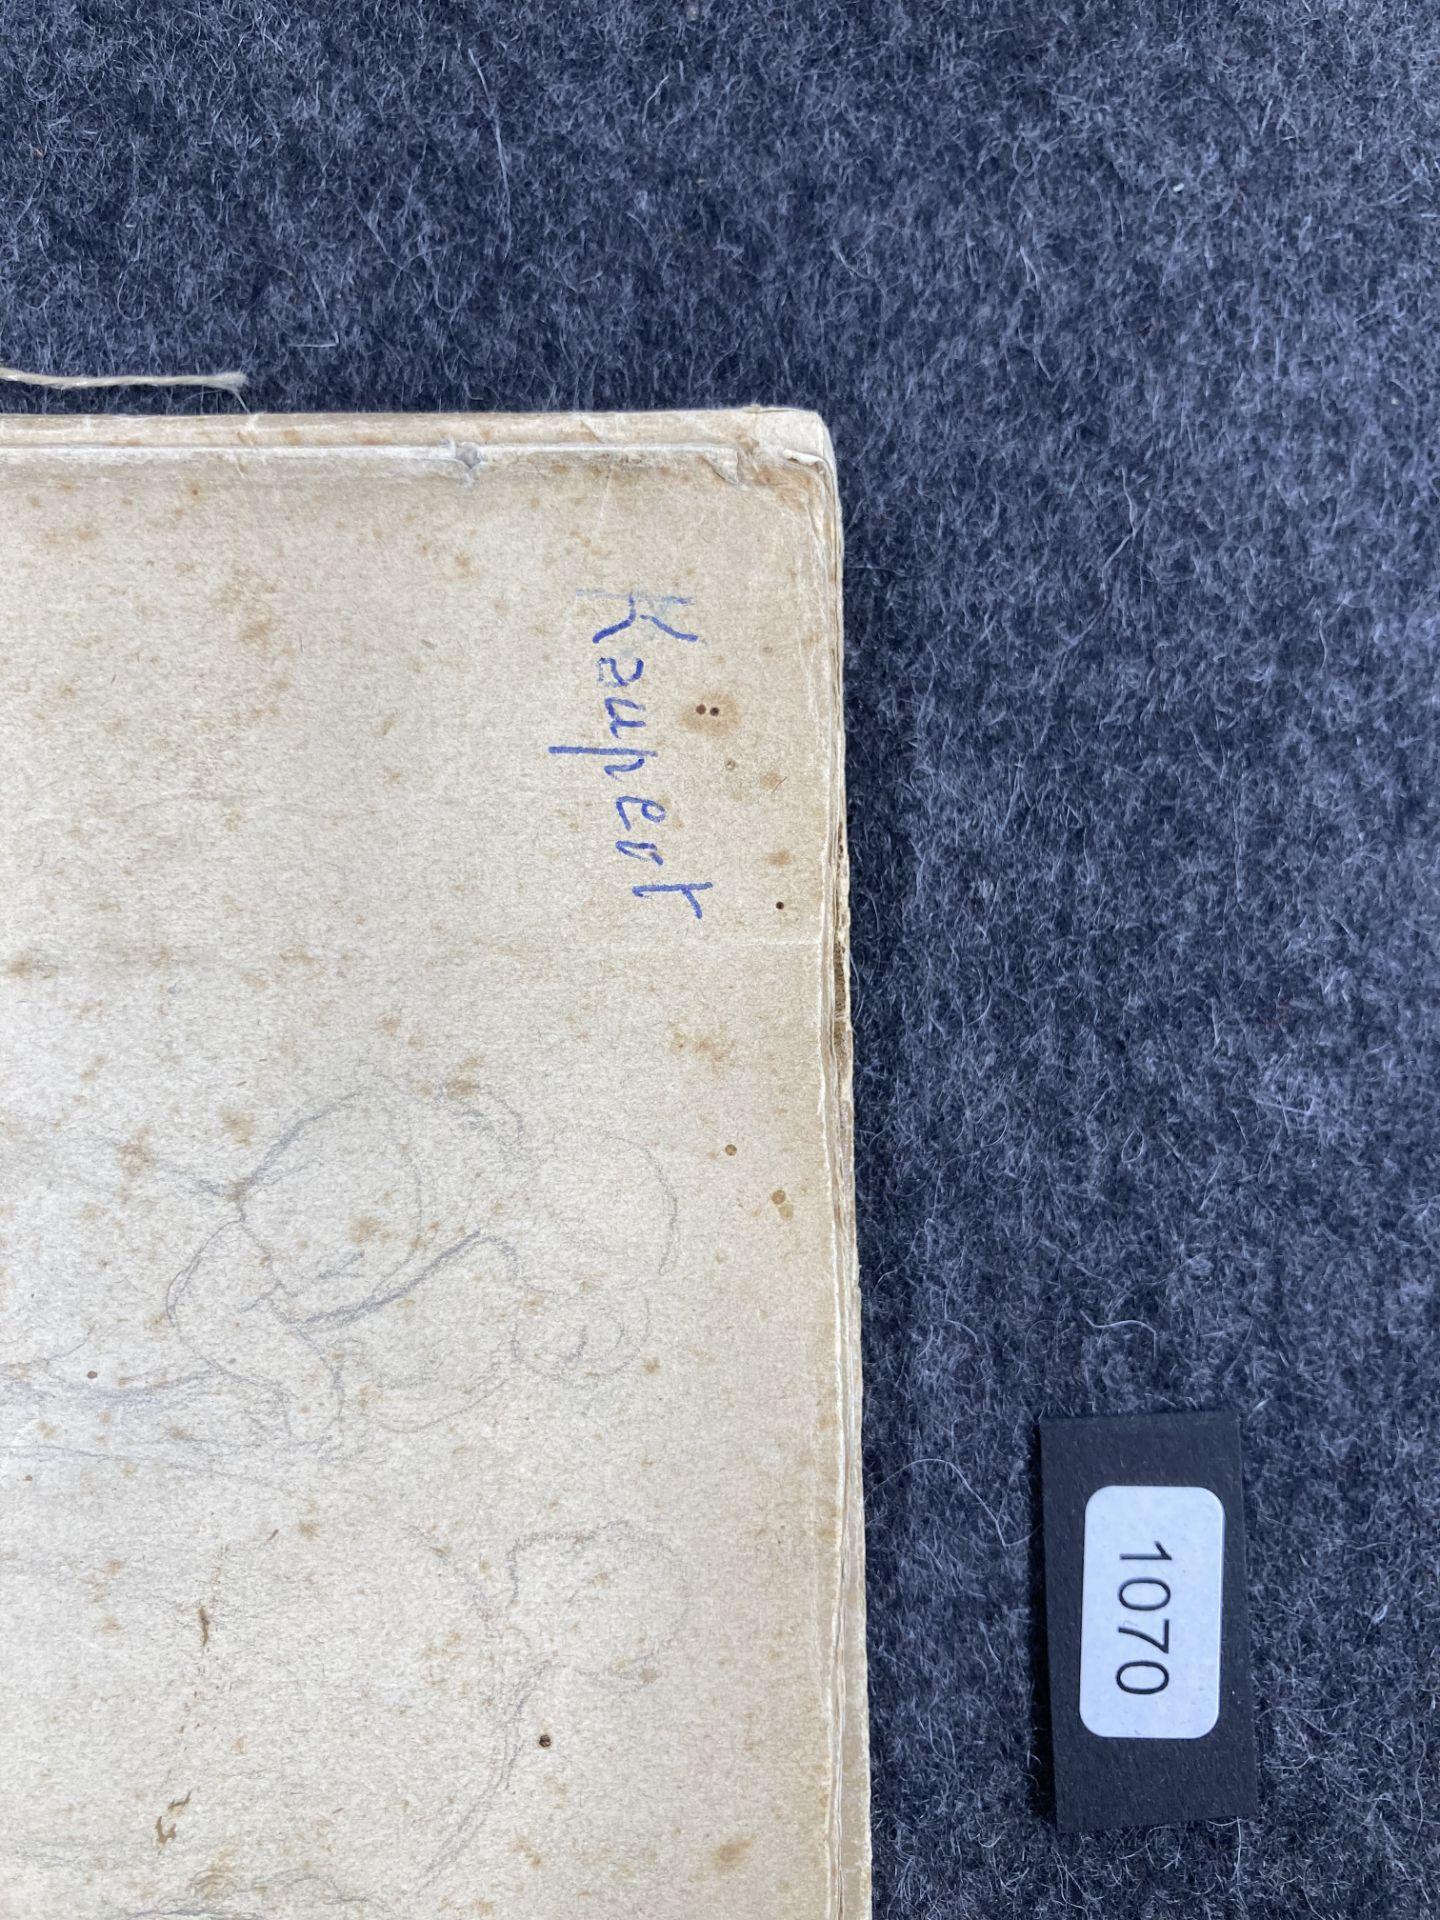 Kaupert, Gustav Kassel 1819 - 1897  Sketchbook, two booklets, each ca. 17 pages. Architectural - Bild 8 aus 8